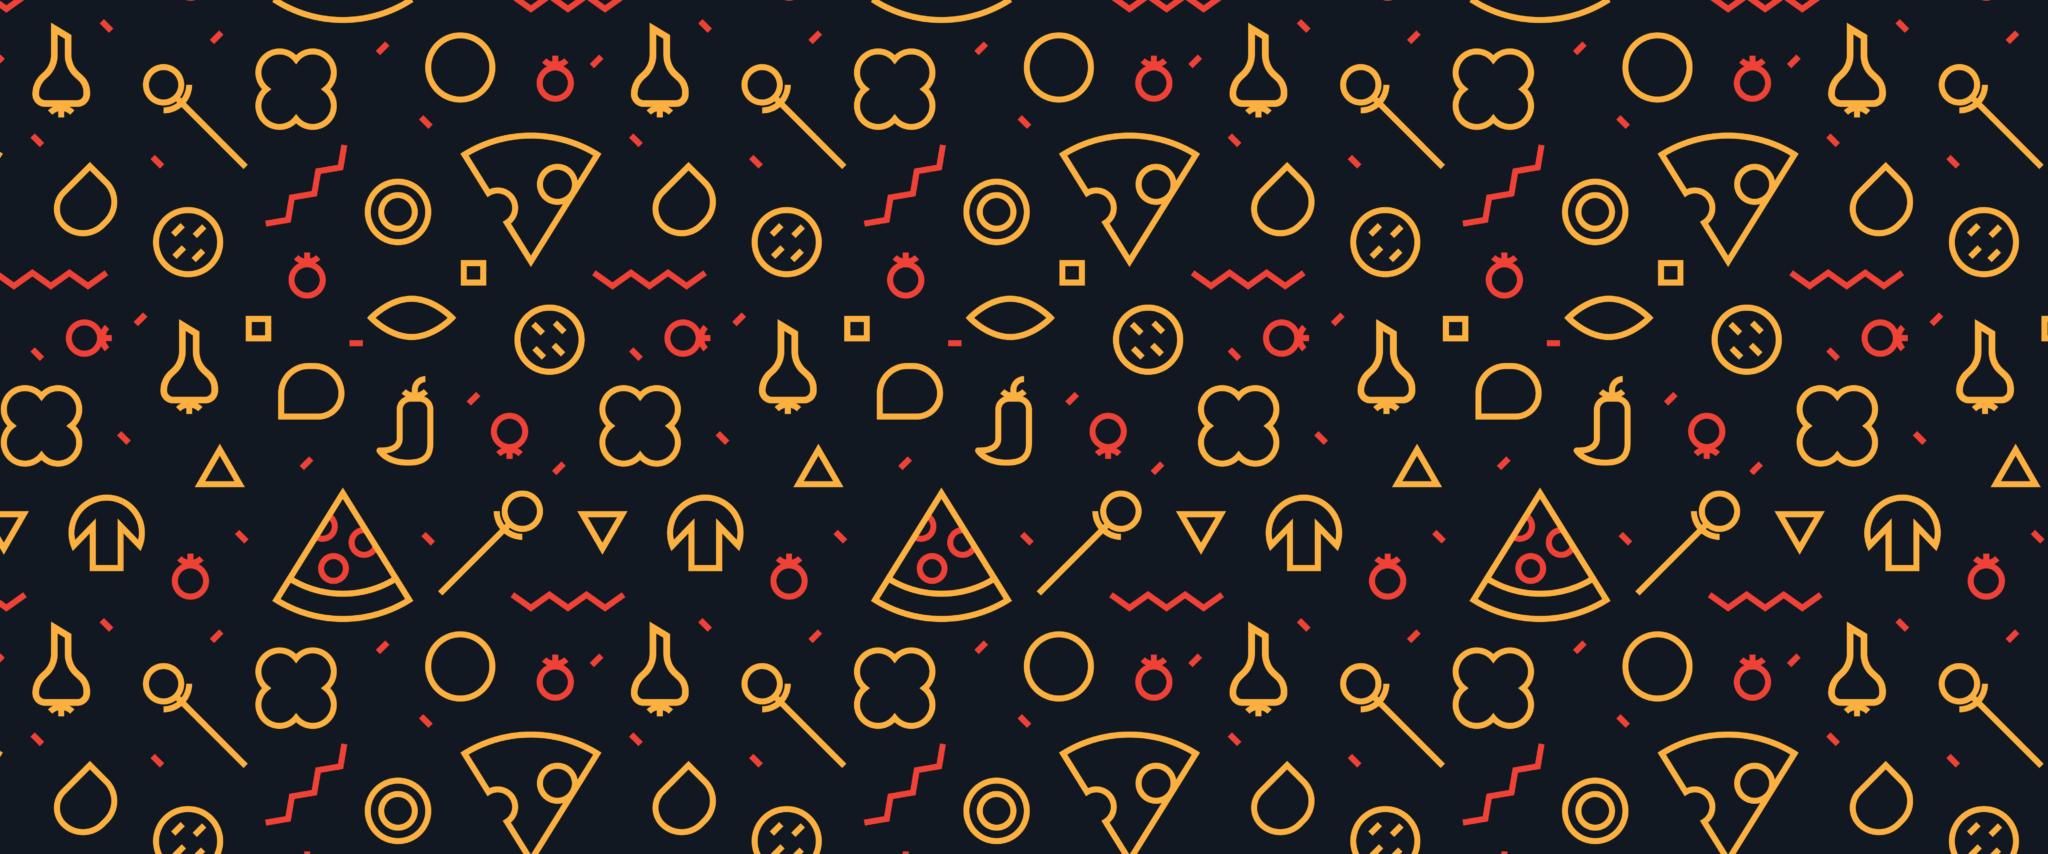 wordpress theme versus custom website blog header pizza print